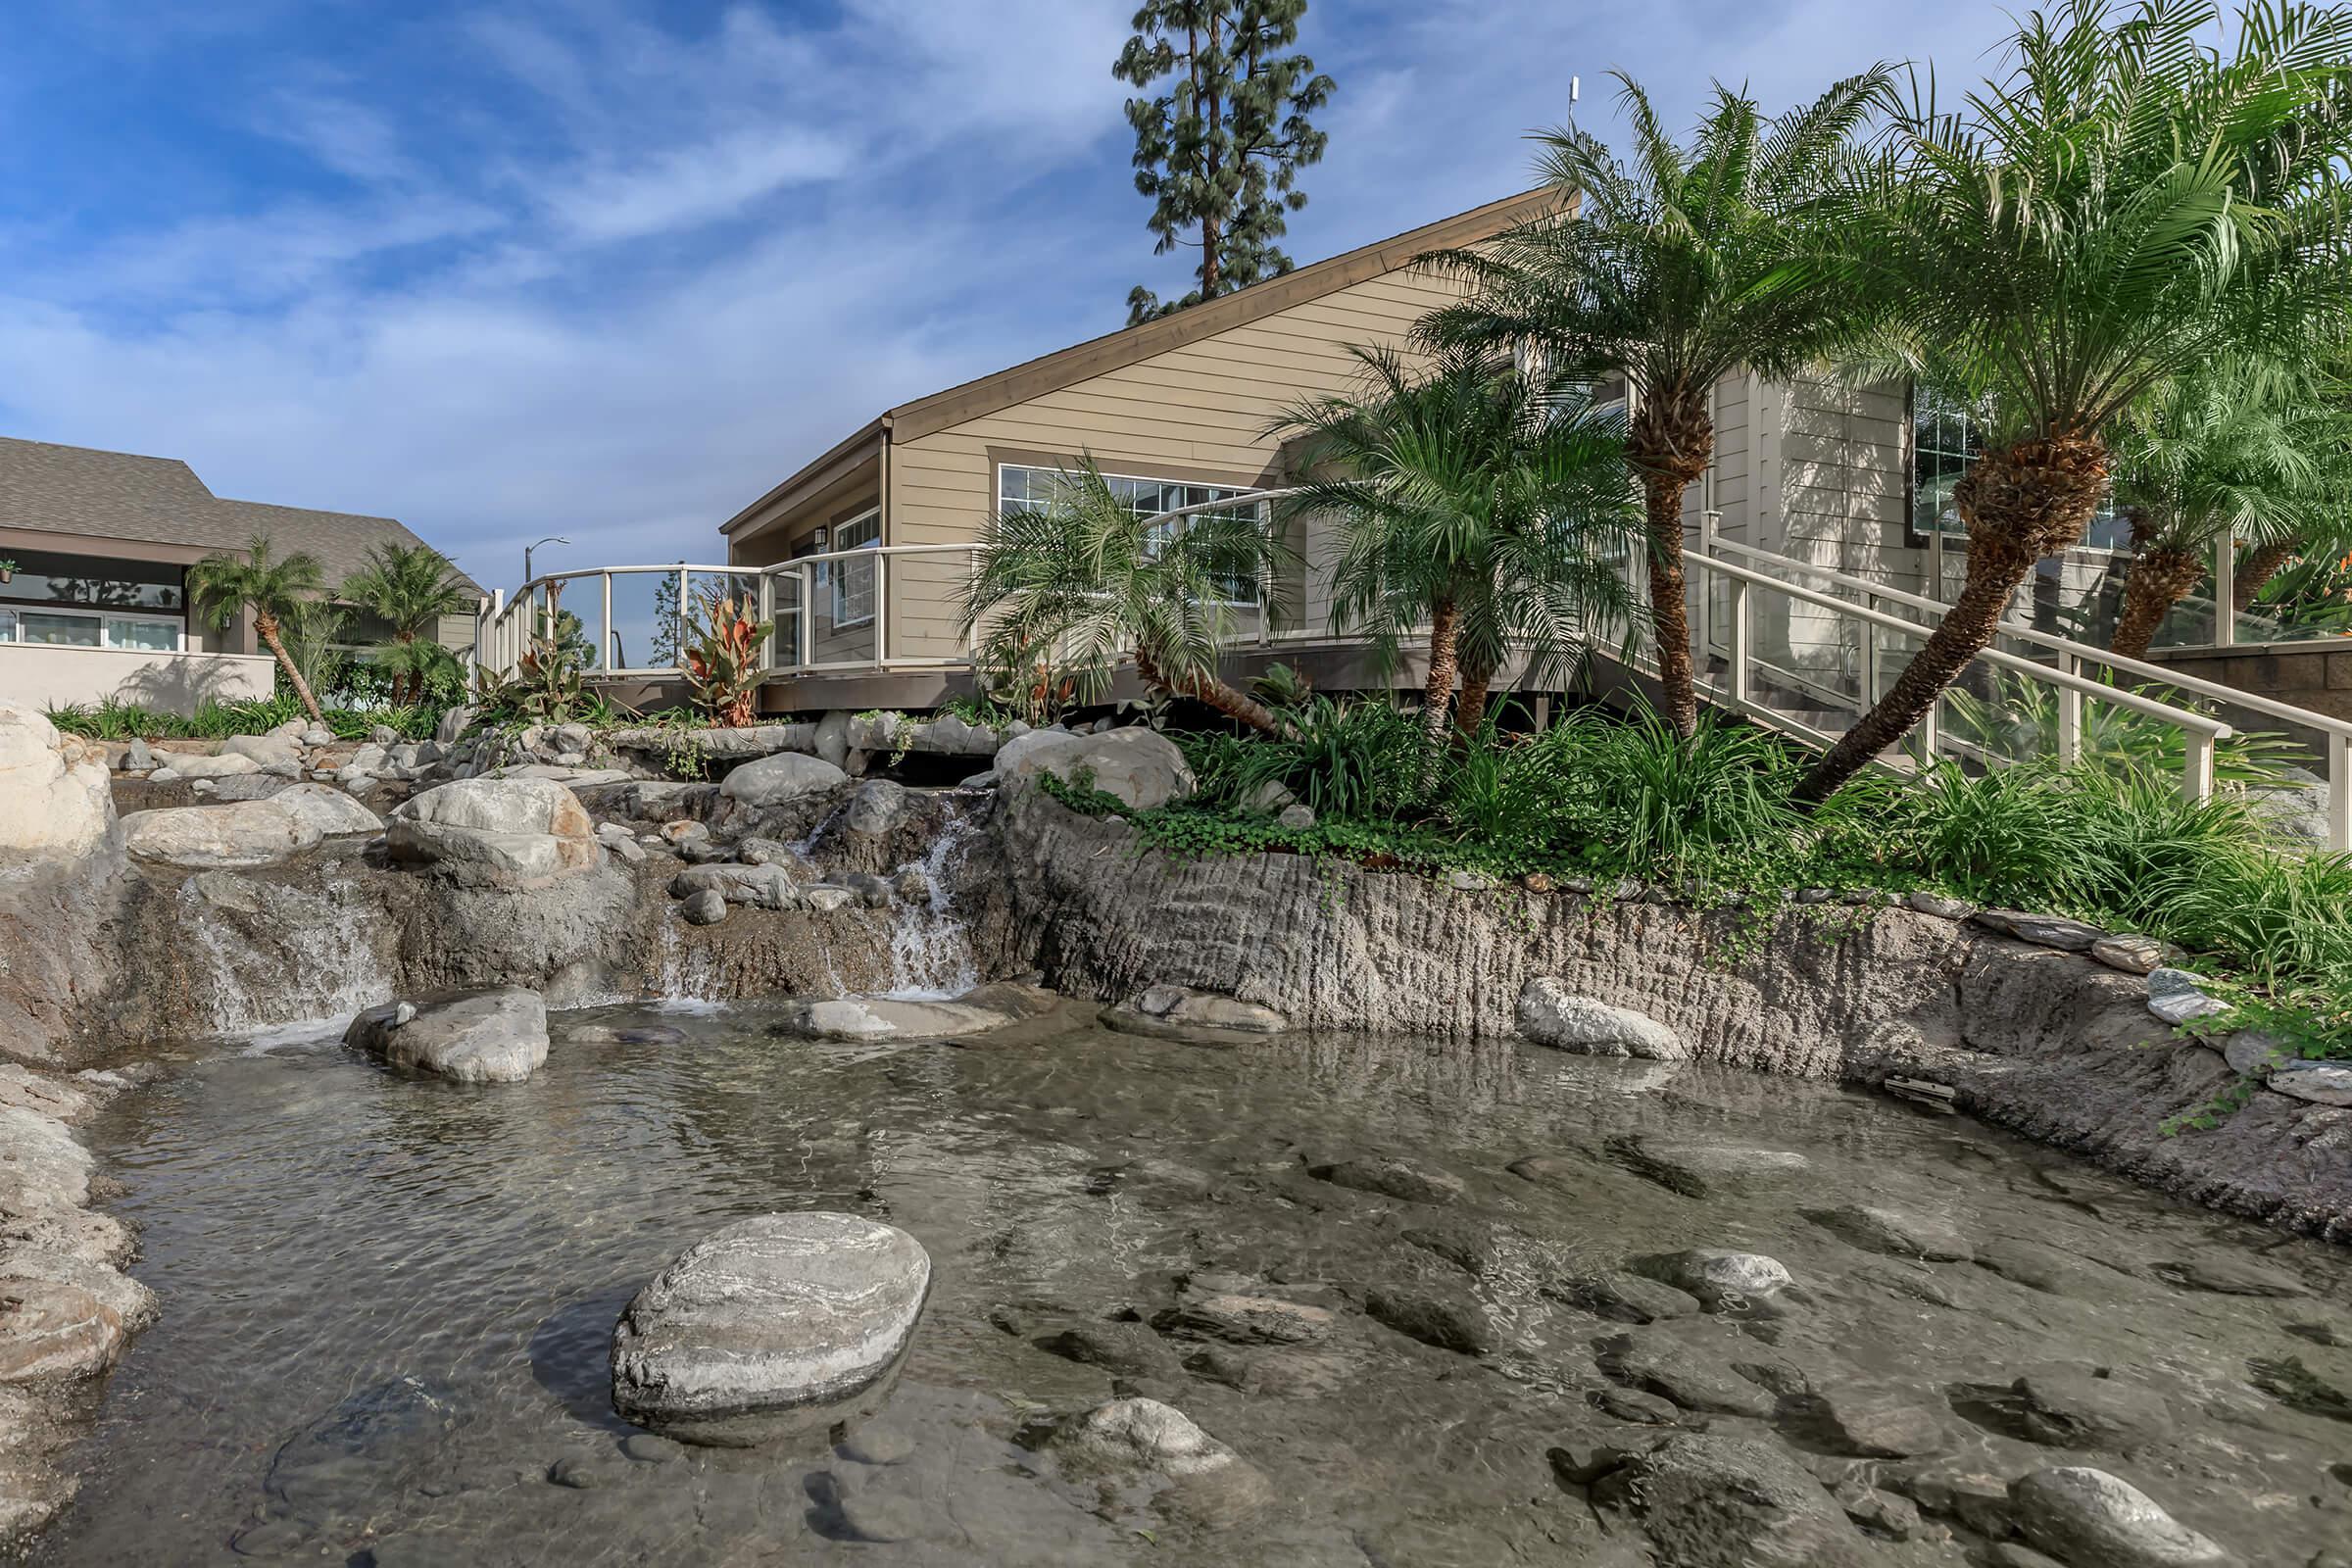 Landscaping at The Lake in Fullerton, CA